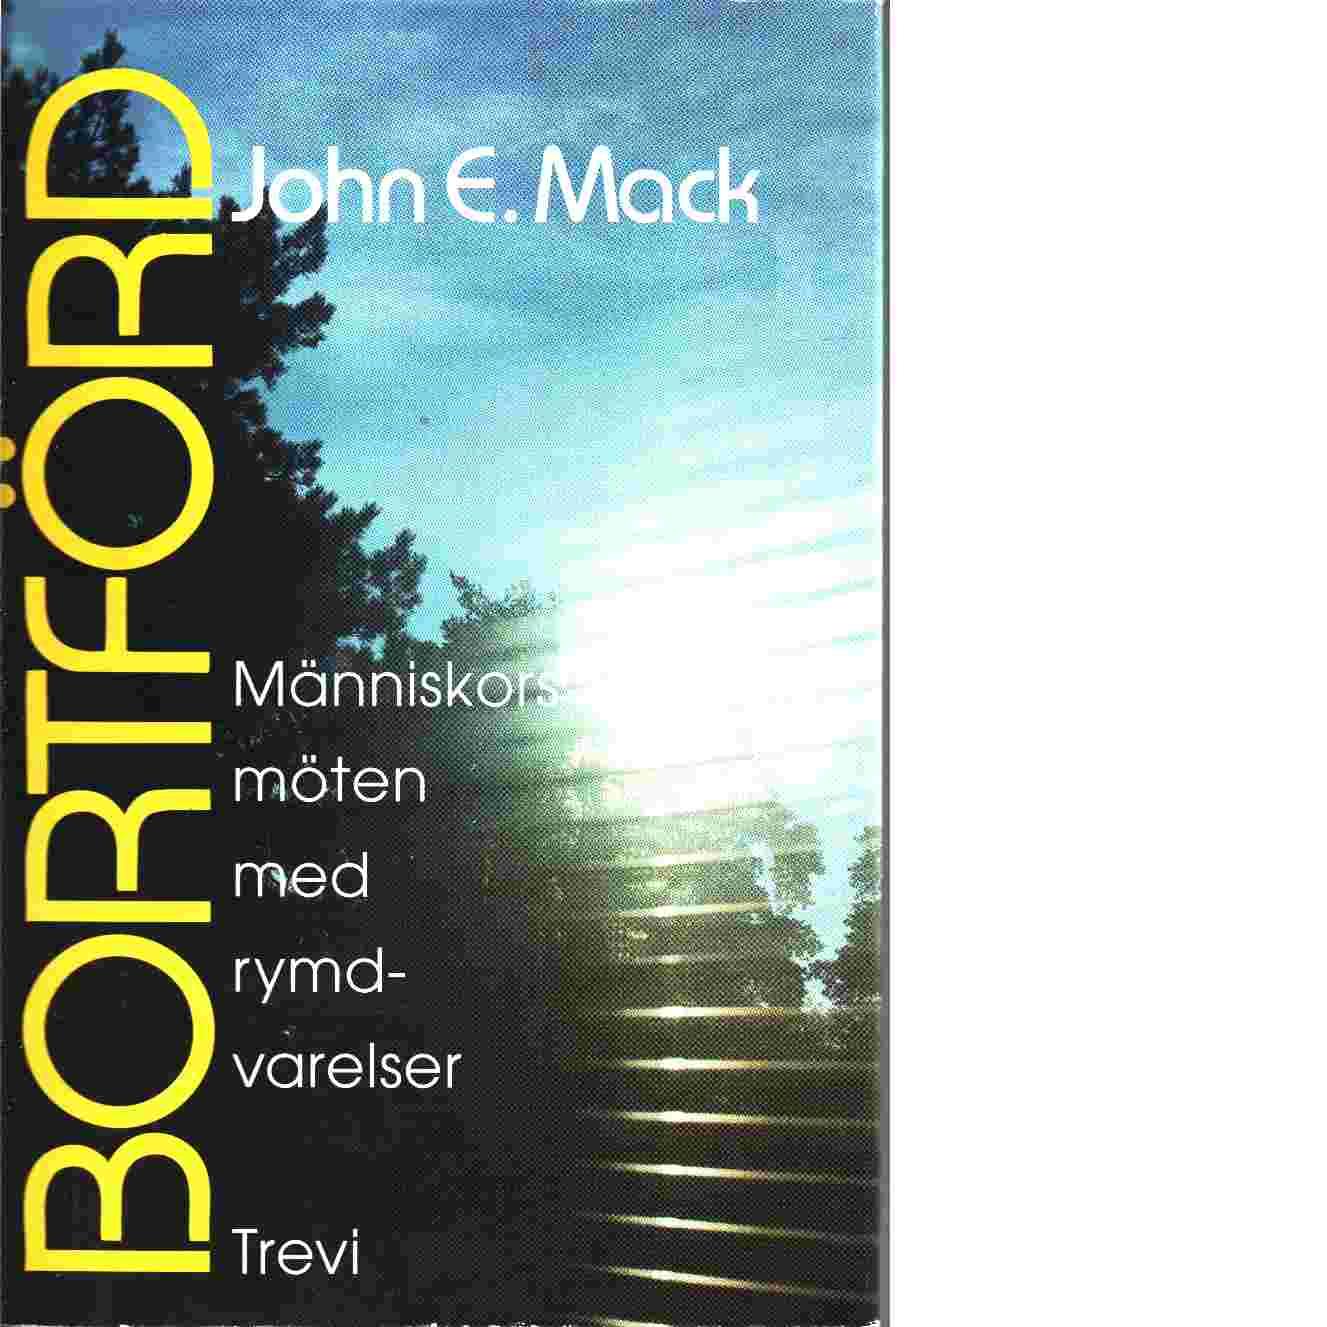 Bortförd - Mack, John E.